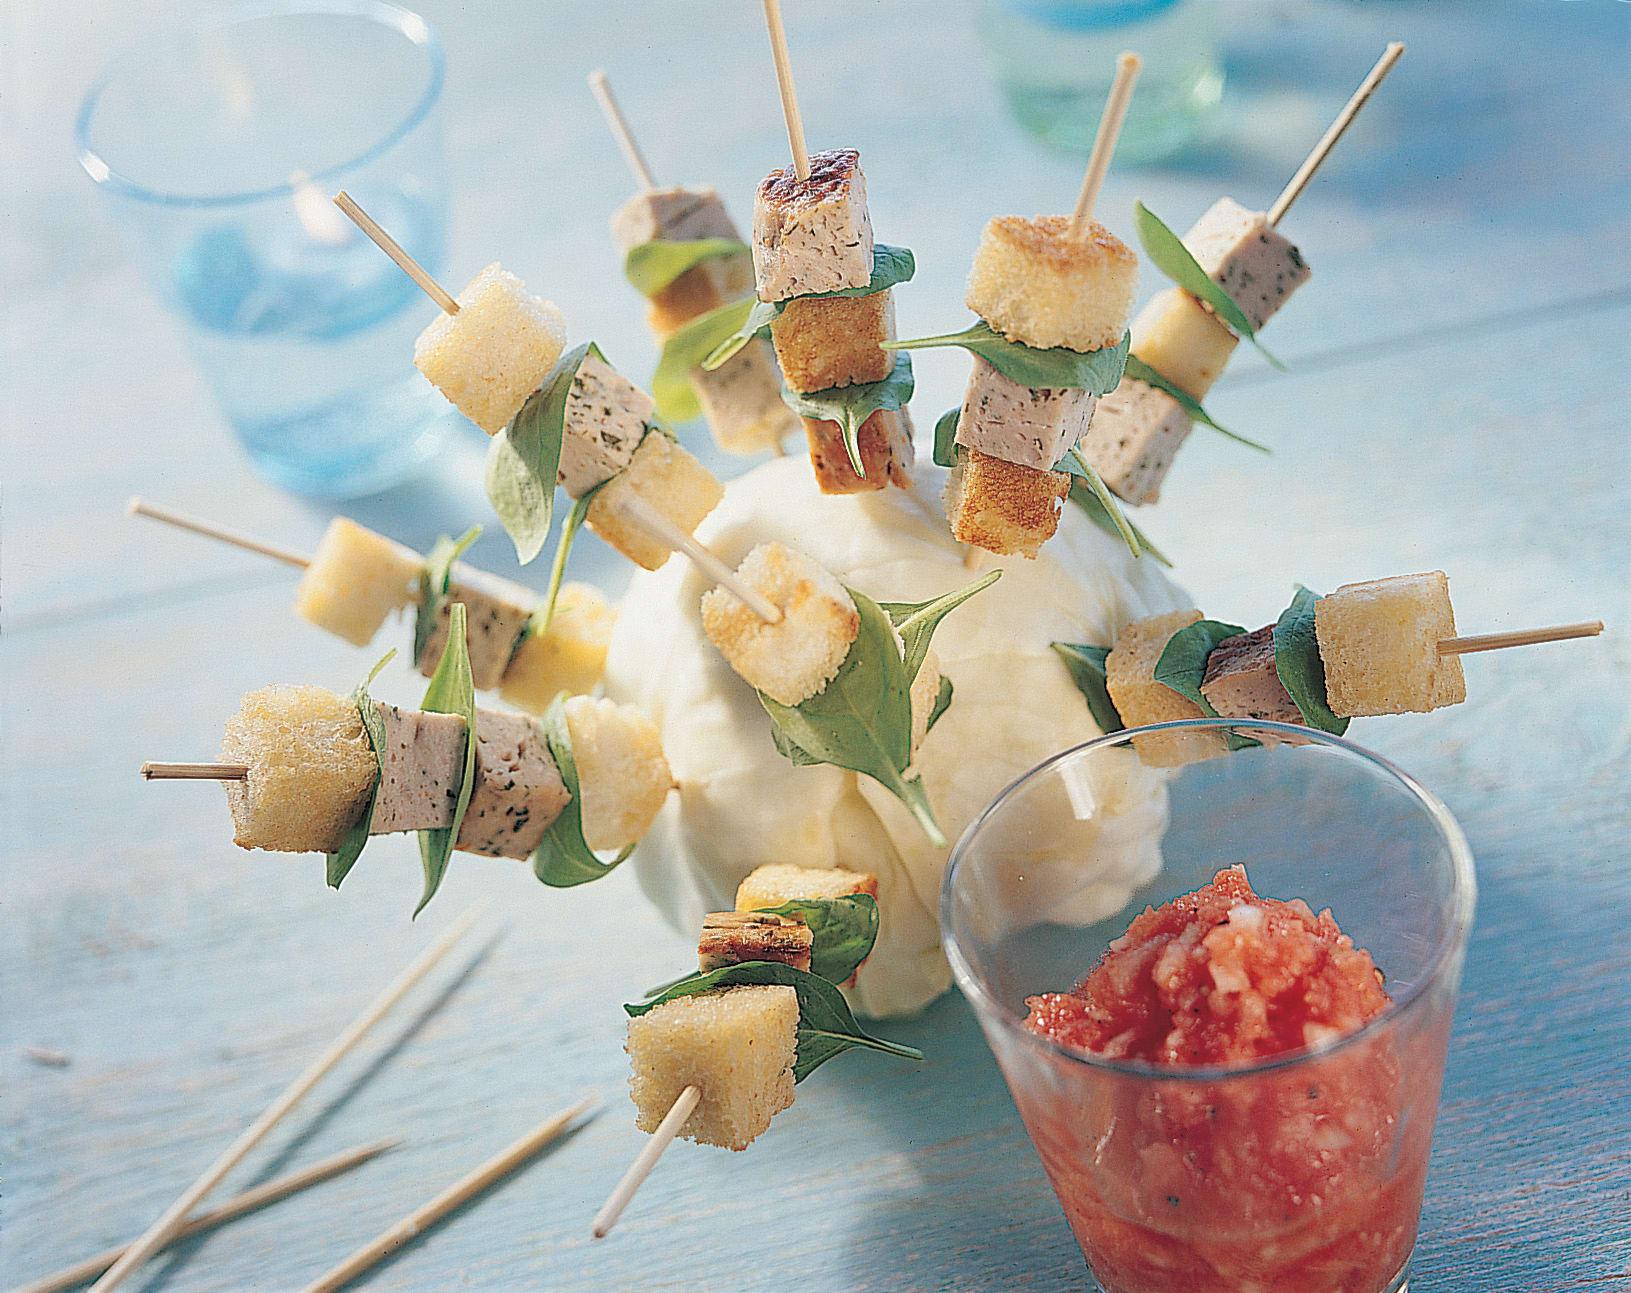 Brochettes de fromage d'Italie